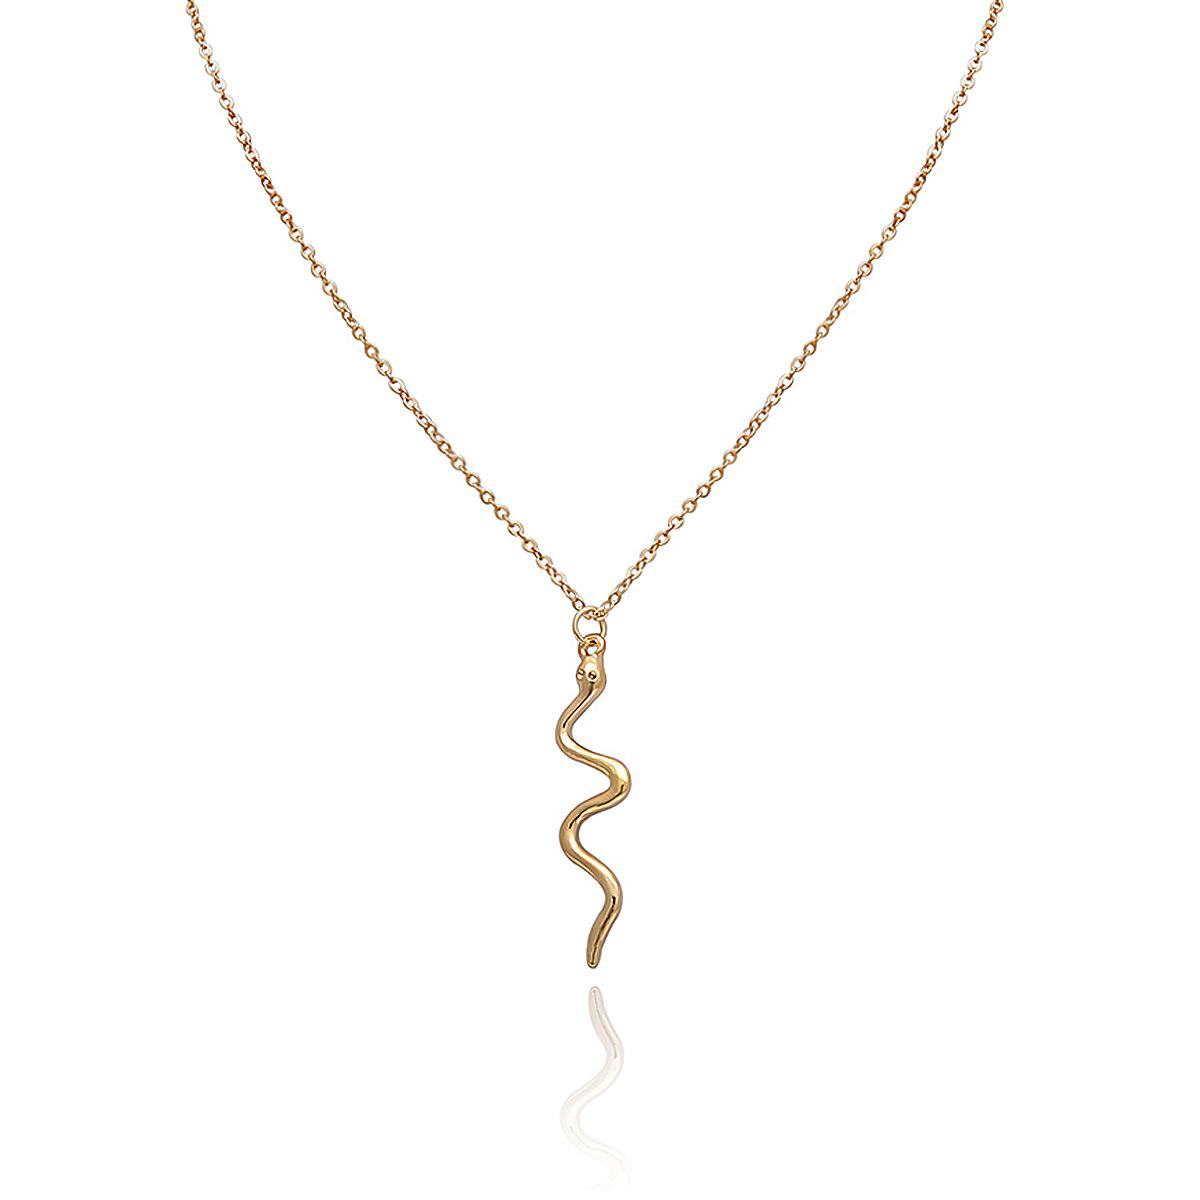 Vintage Serpentine Pendant Curved Geometric Necklace NHXR141811